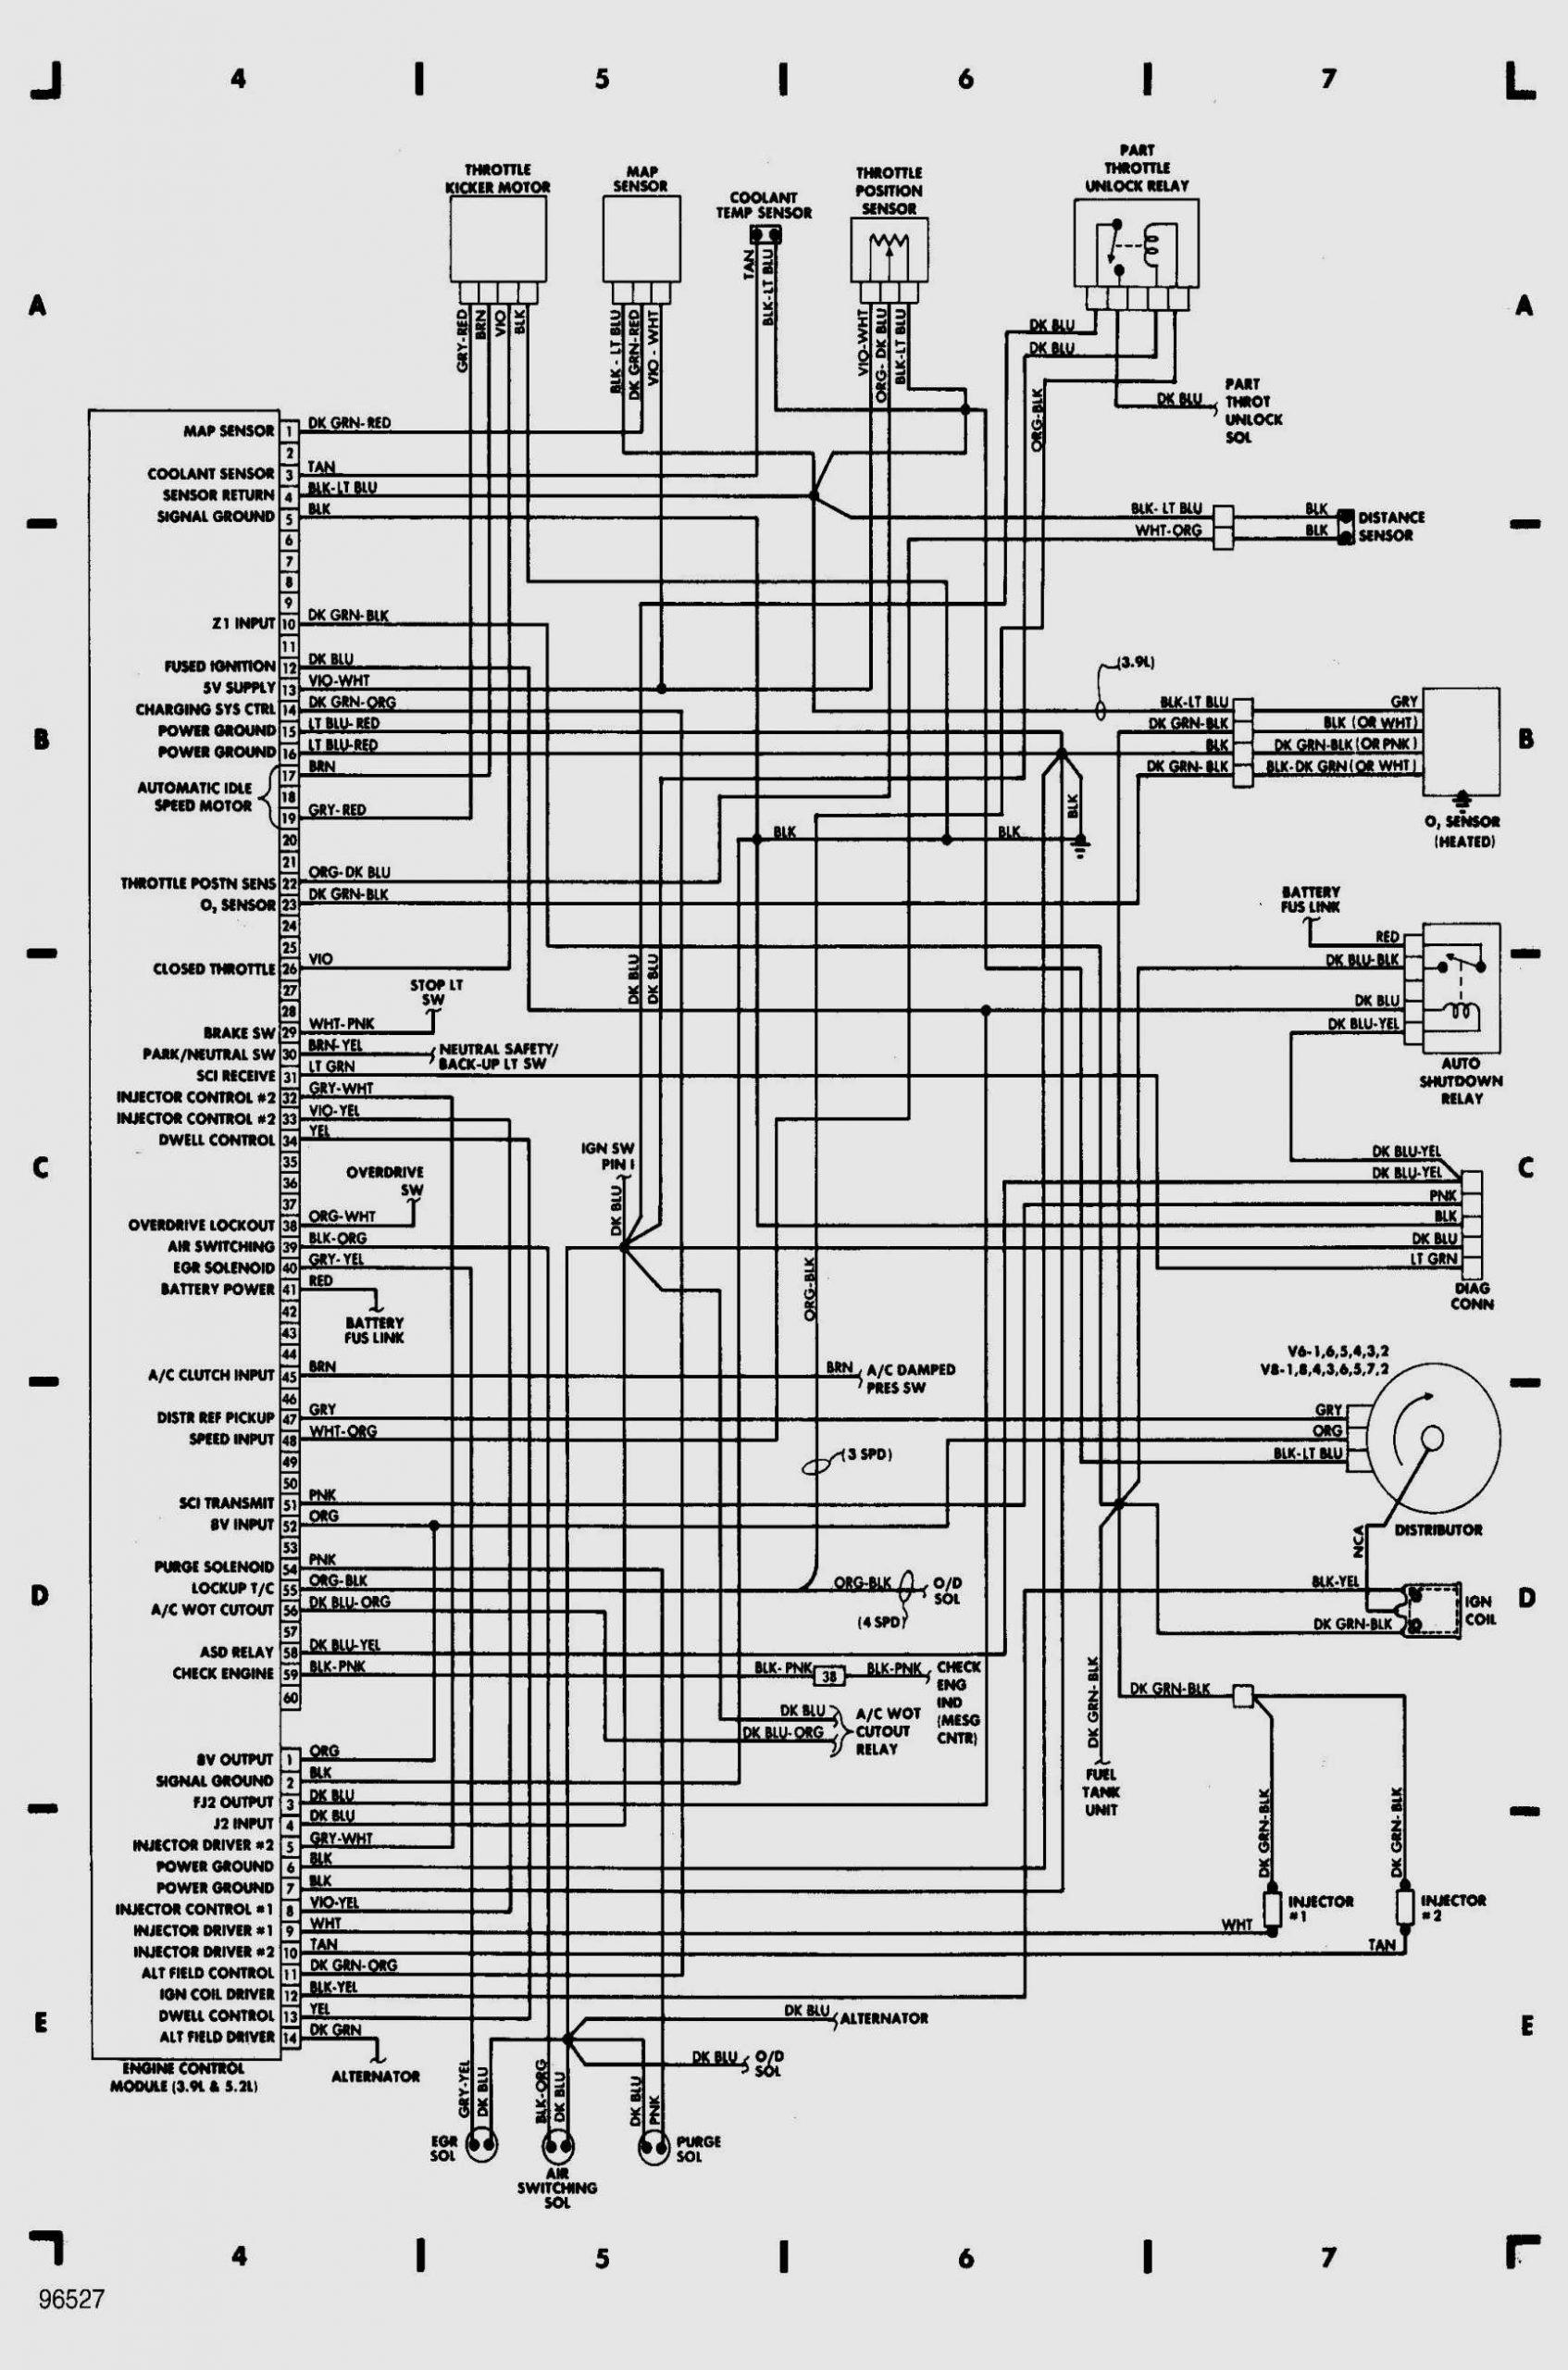 2016 Dodge Ram 1500 Wiring Diagram Ground Bus Diagram] Ram 1500 Light Wiring Diagram Full Version Hd Quality ...